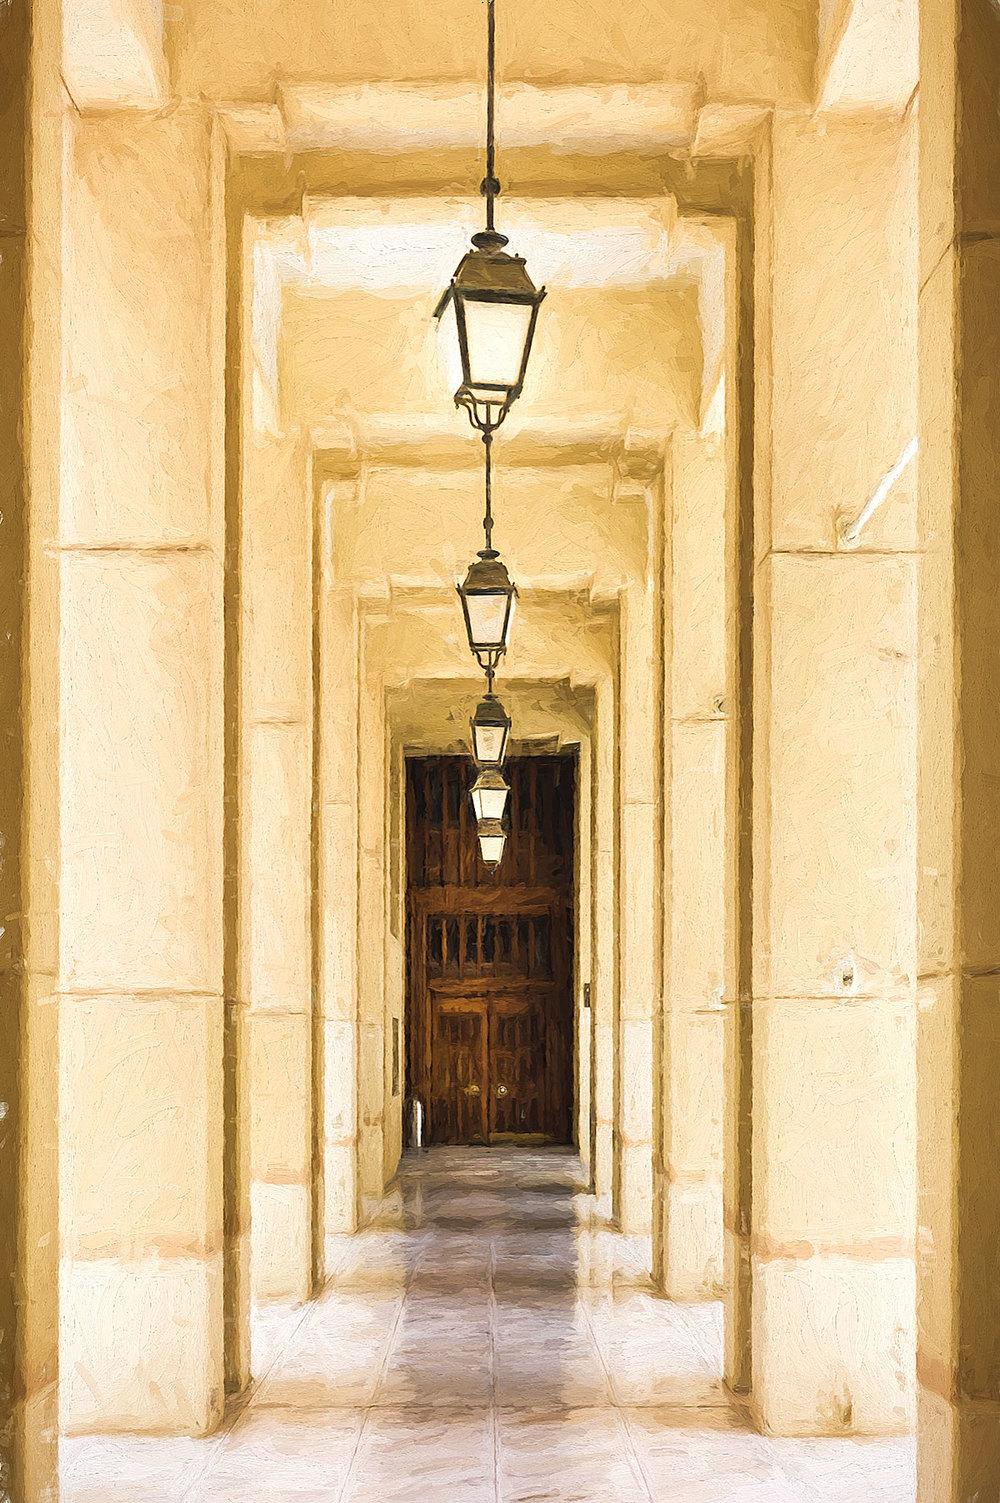 Cezanne's Hall